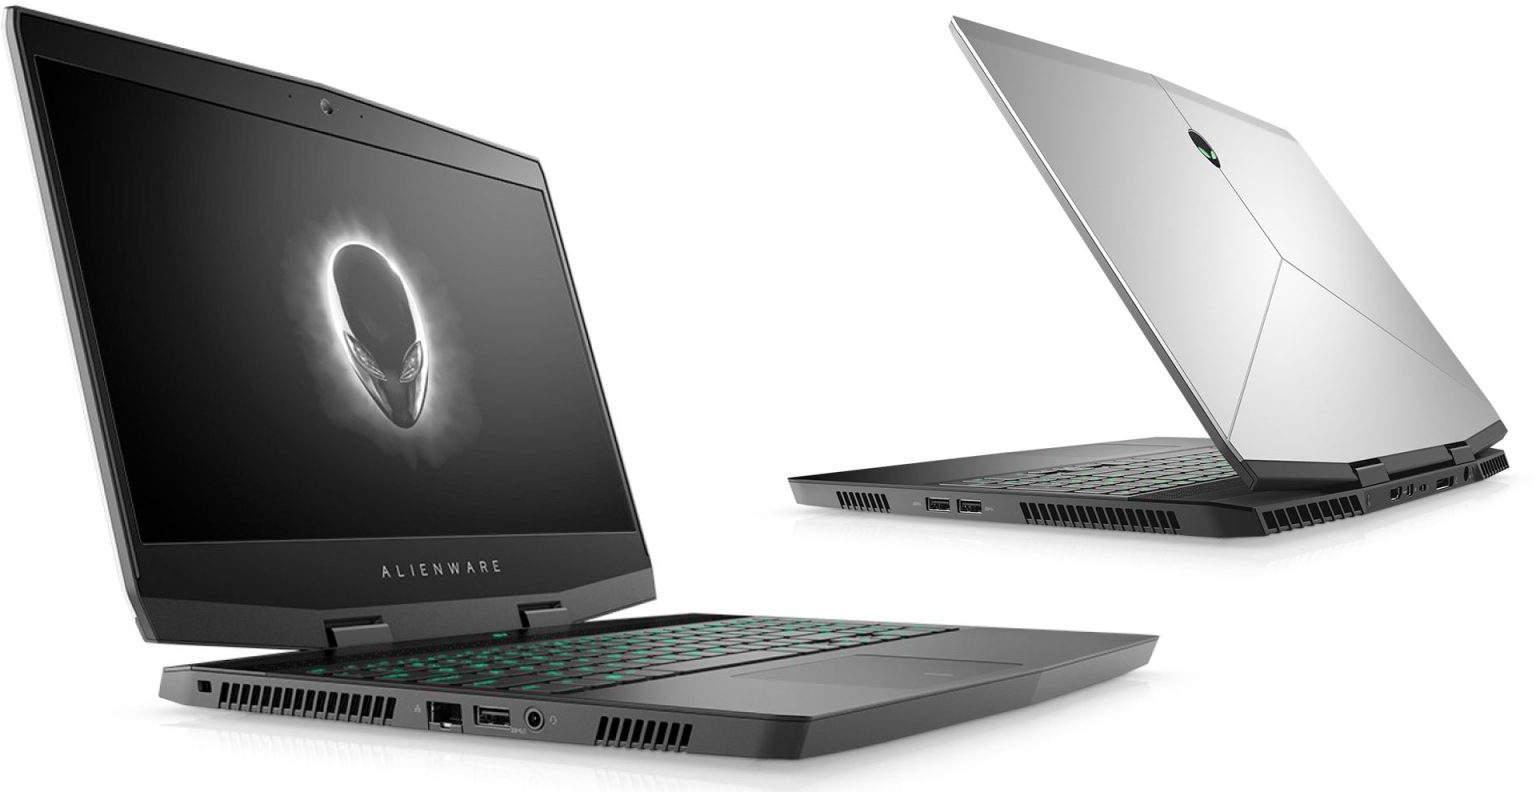 Купить Ноутбук Dell Alienware M15 (M15-5942) фото 3